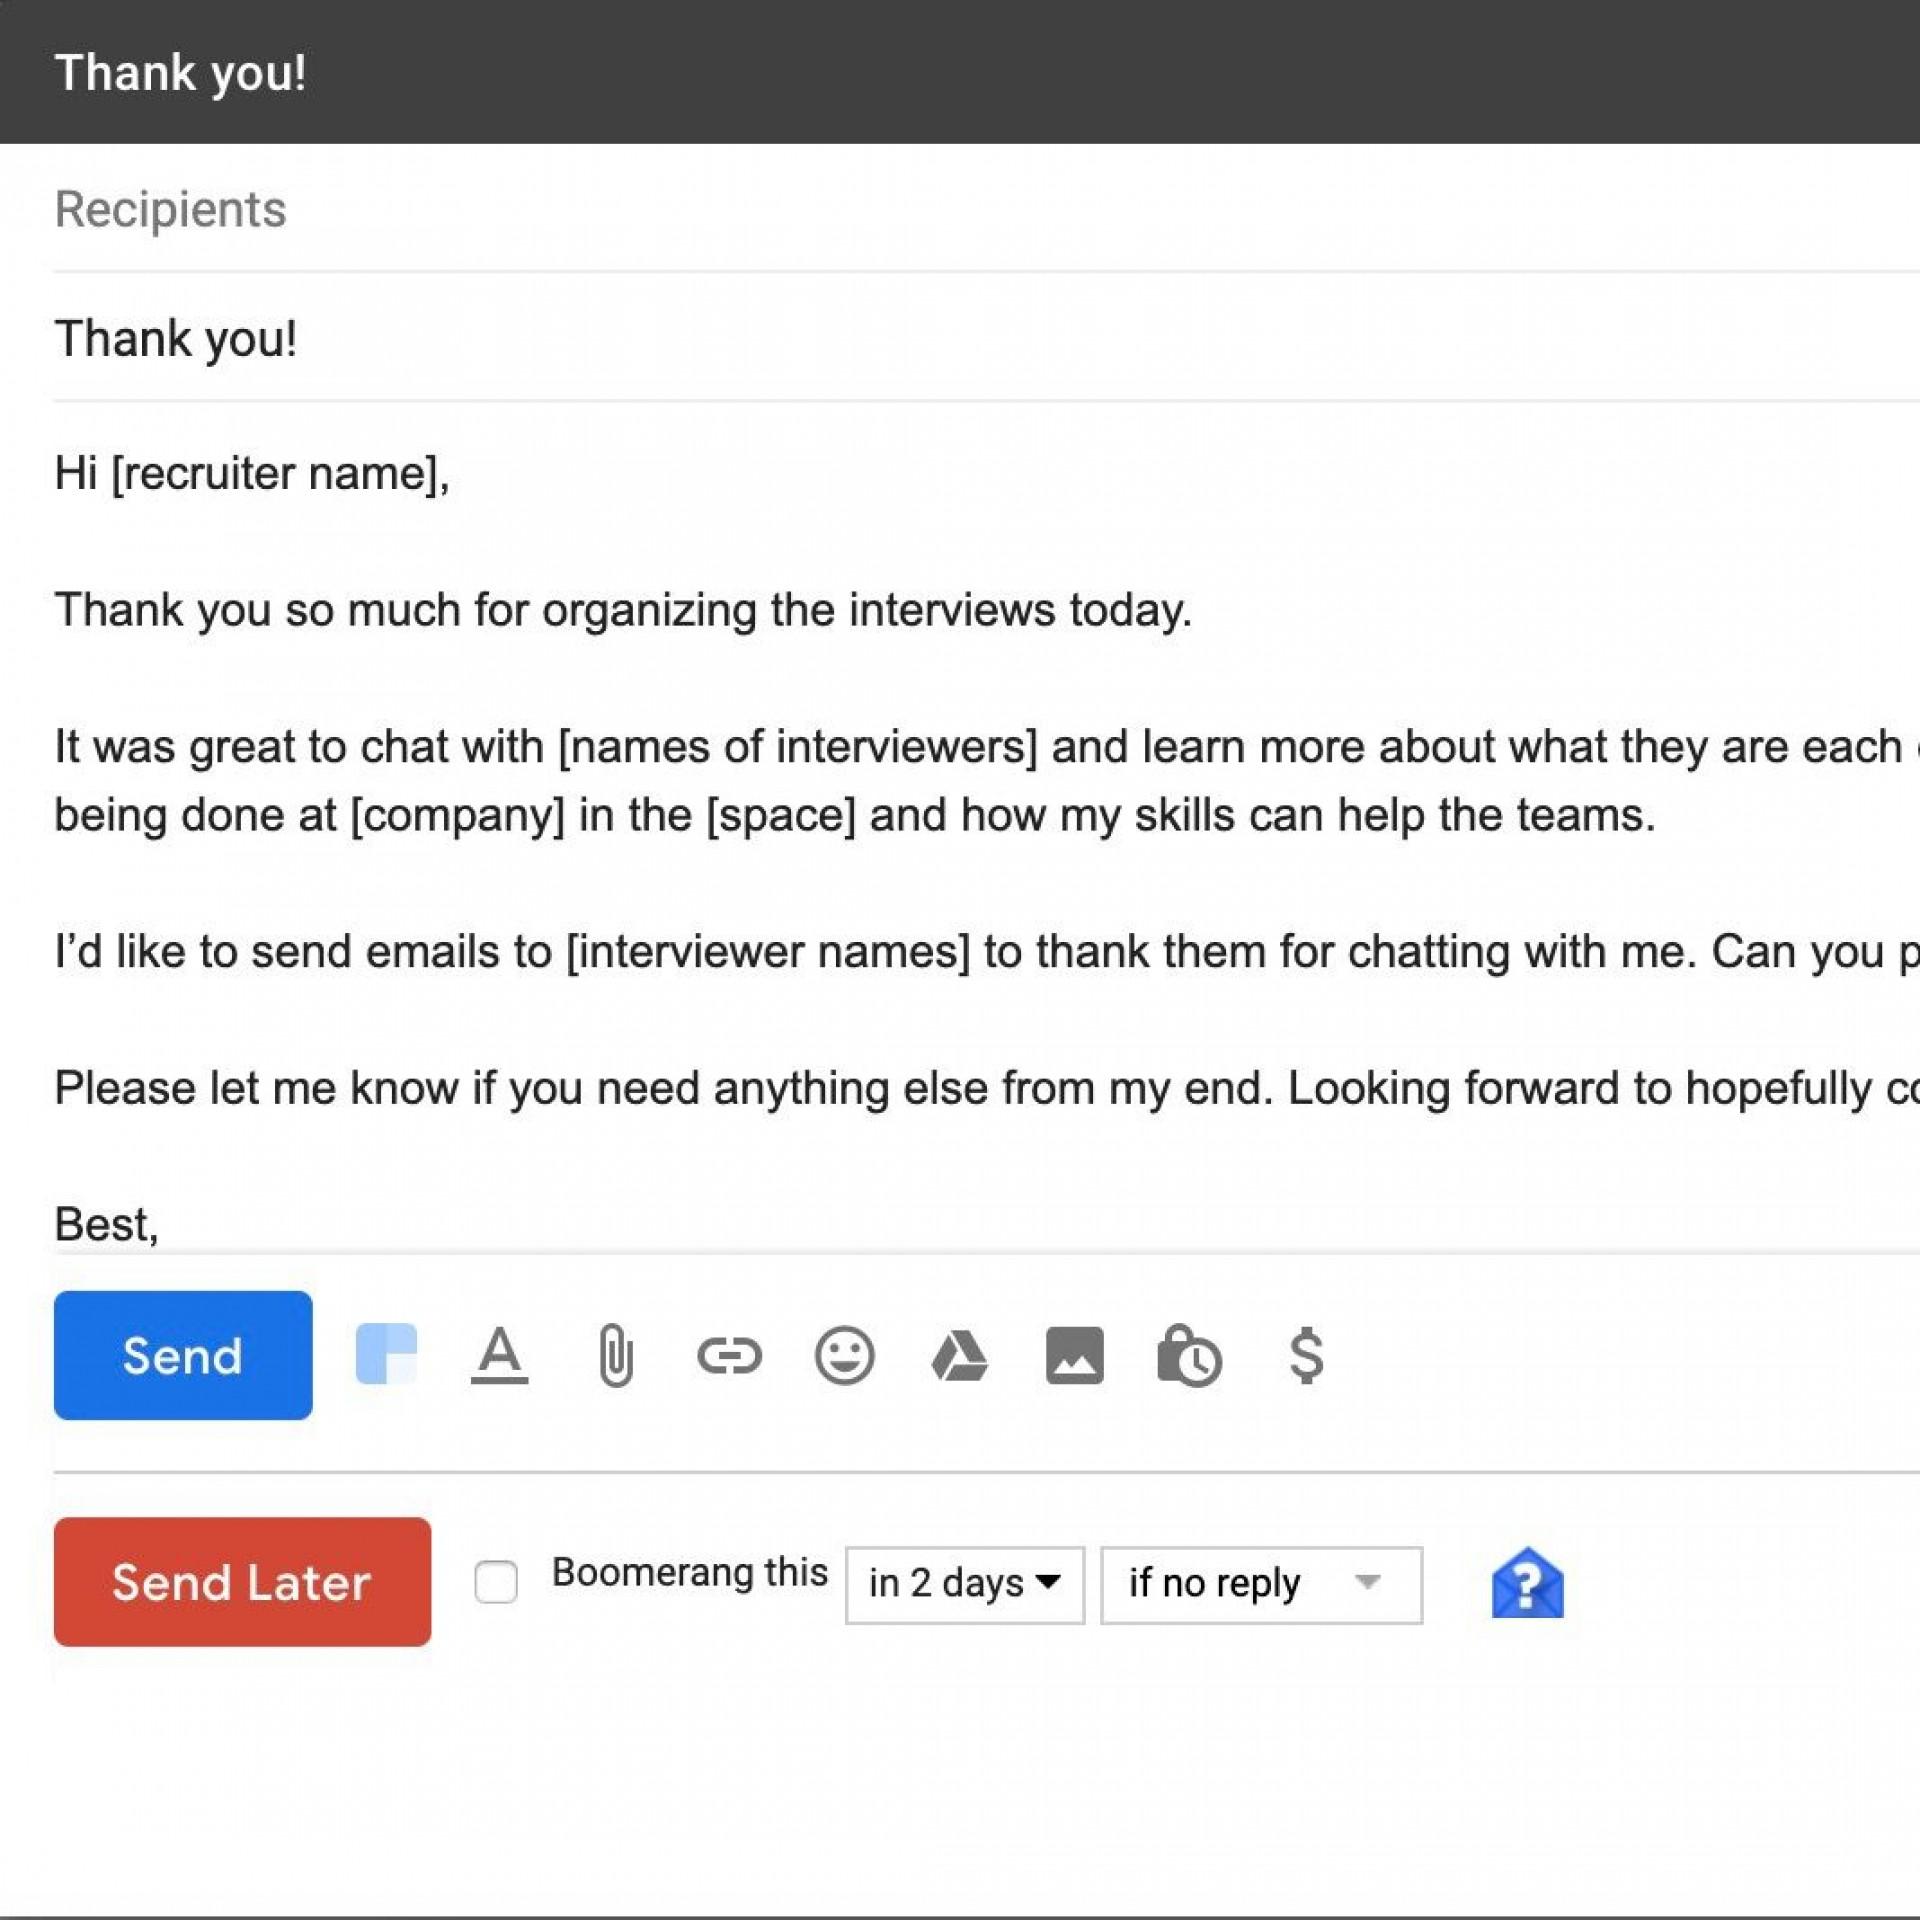 009 Beautiful Follow Up Email Template After No Response Inspiration 1920